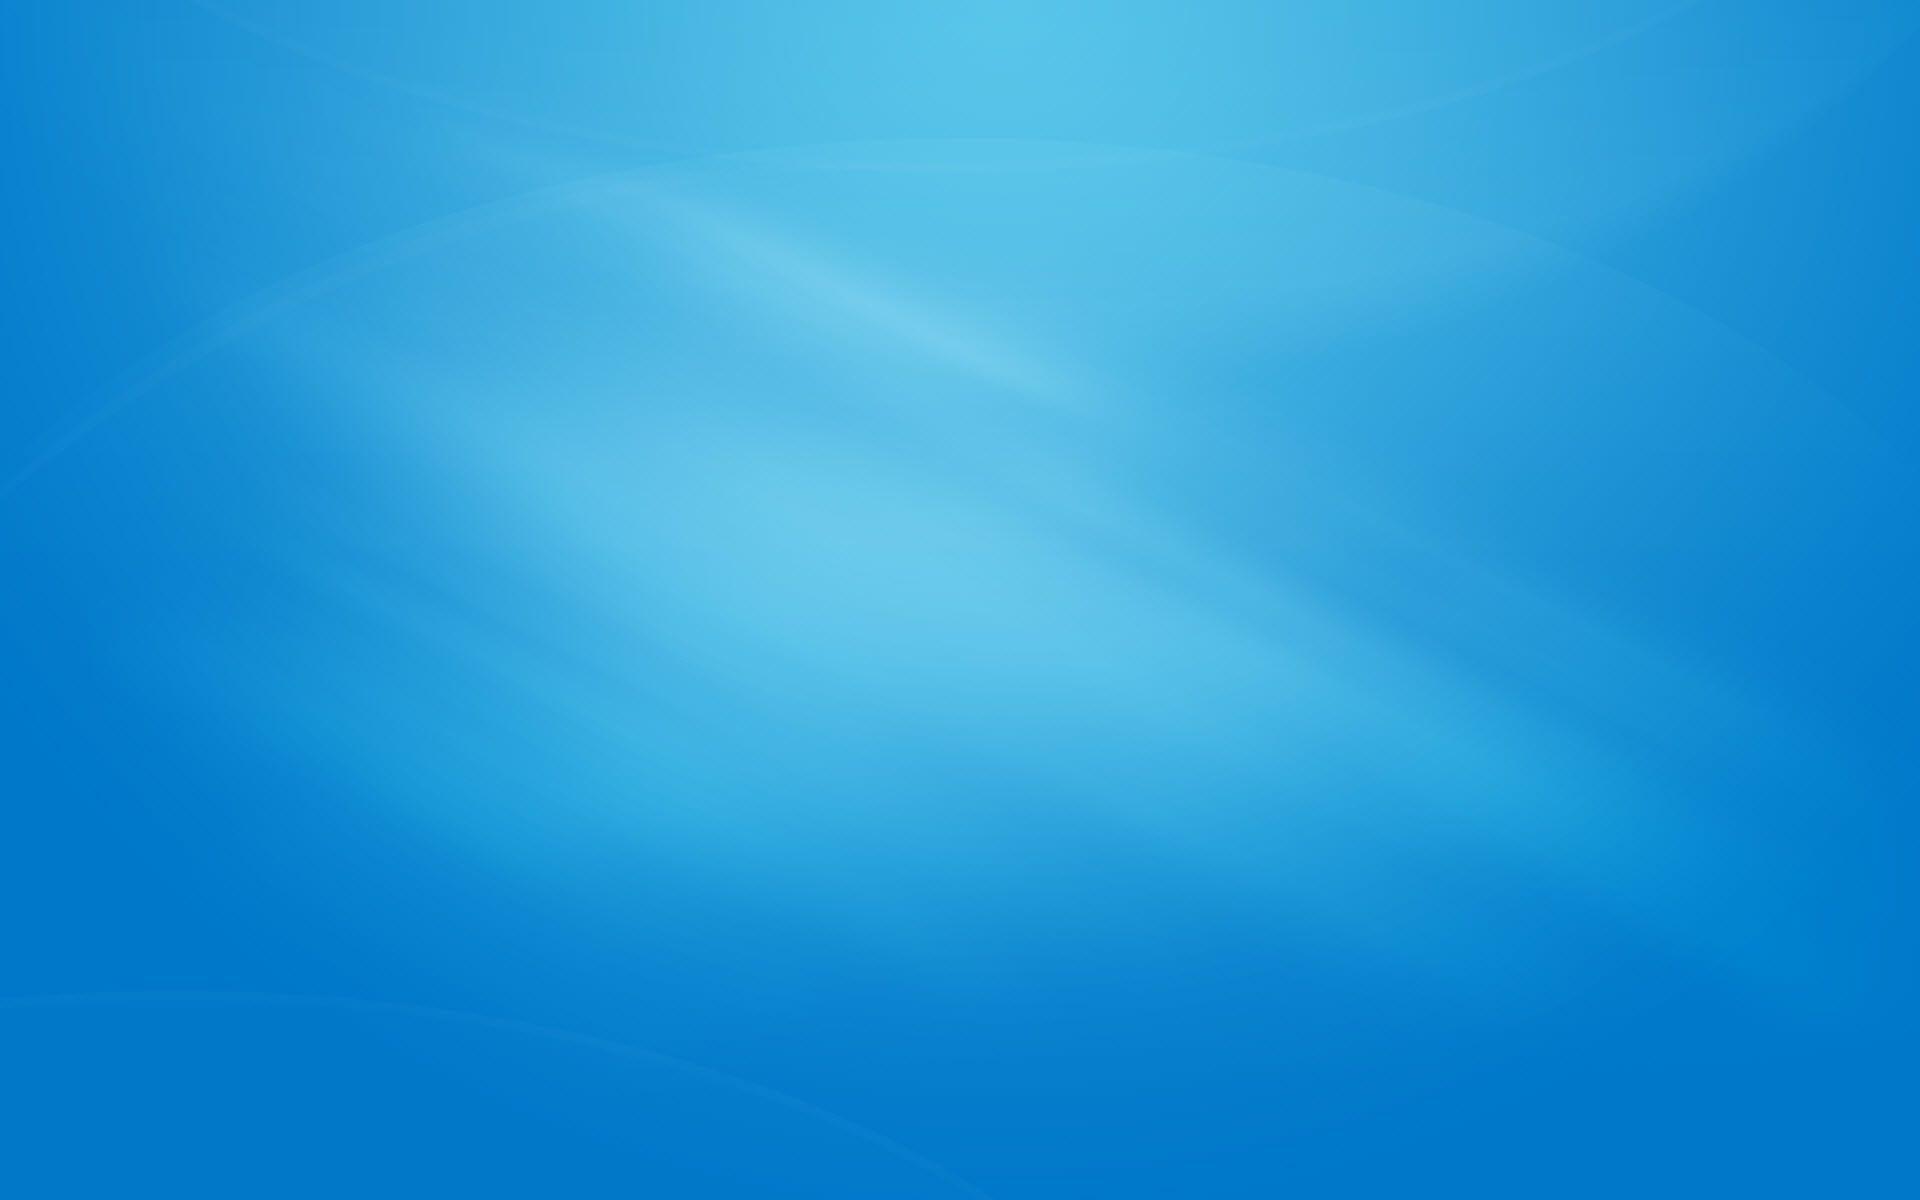 HD Desktop Blue Wallpapers